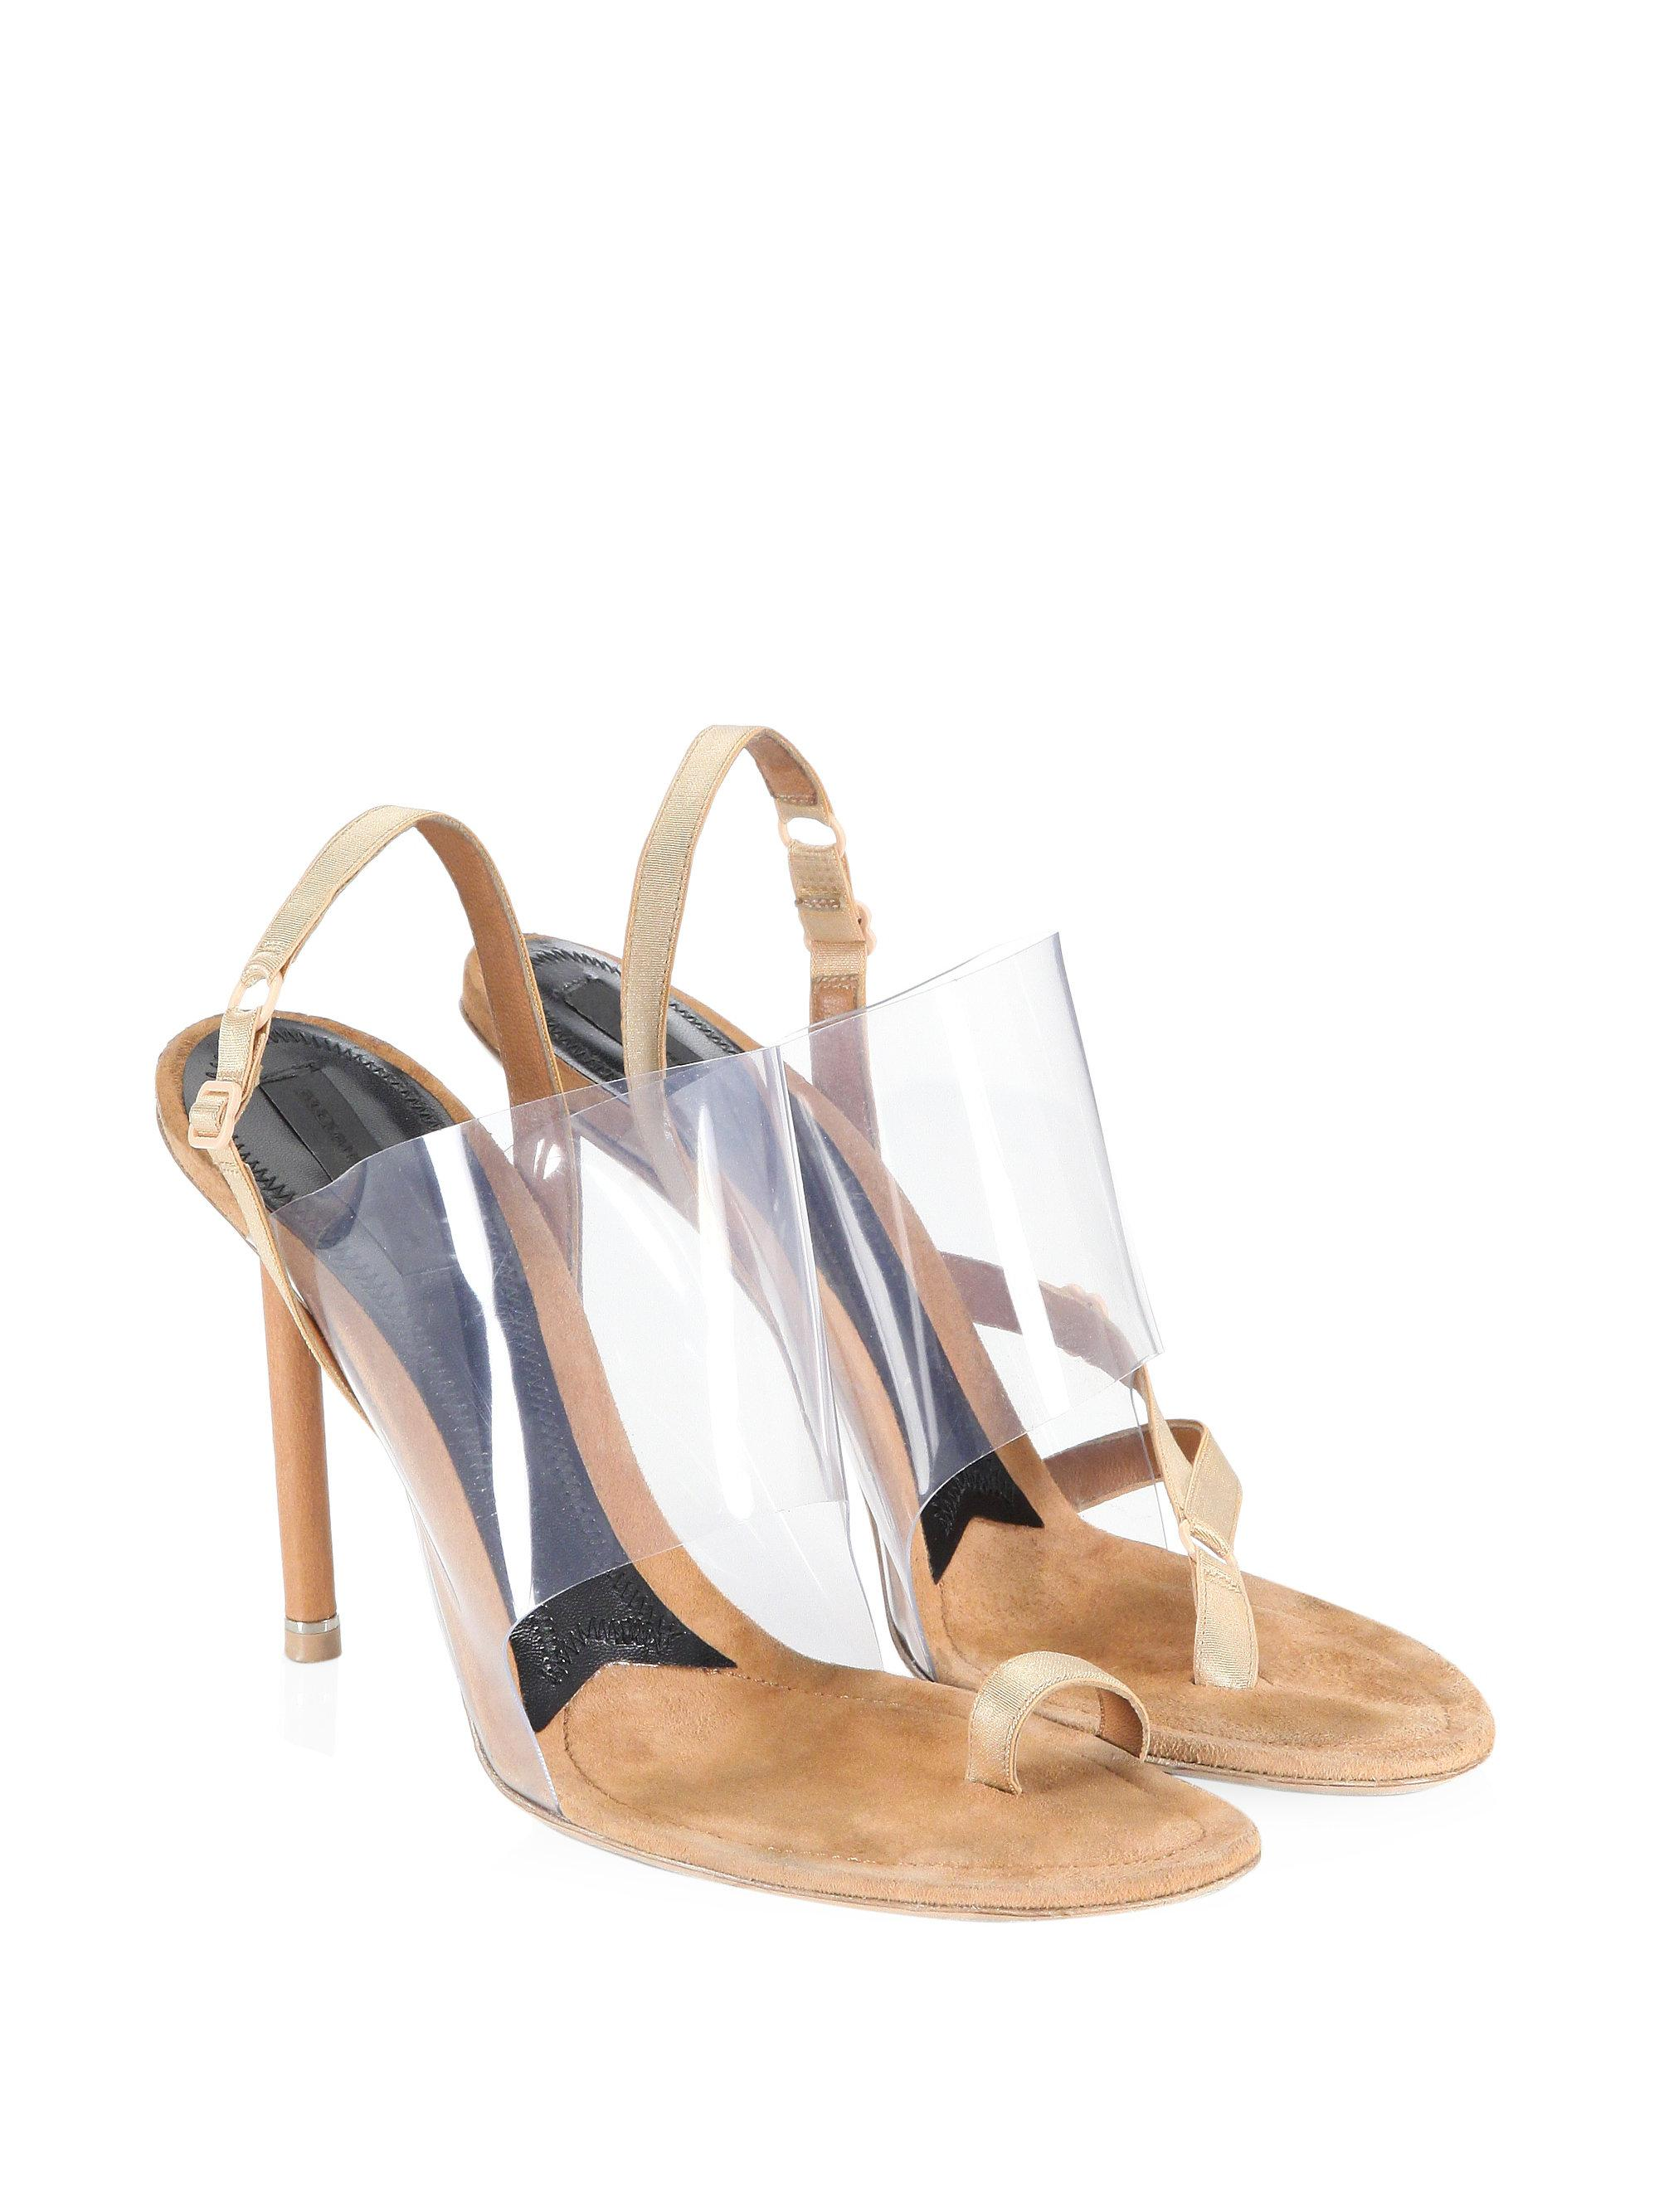 d7311fb64bb Women's Kaia Pvc High Heel Sandals